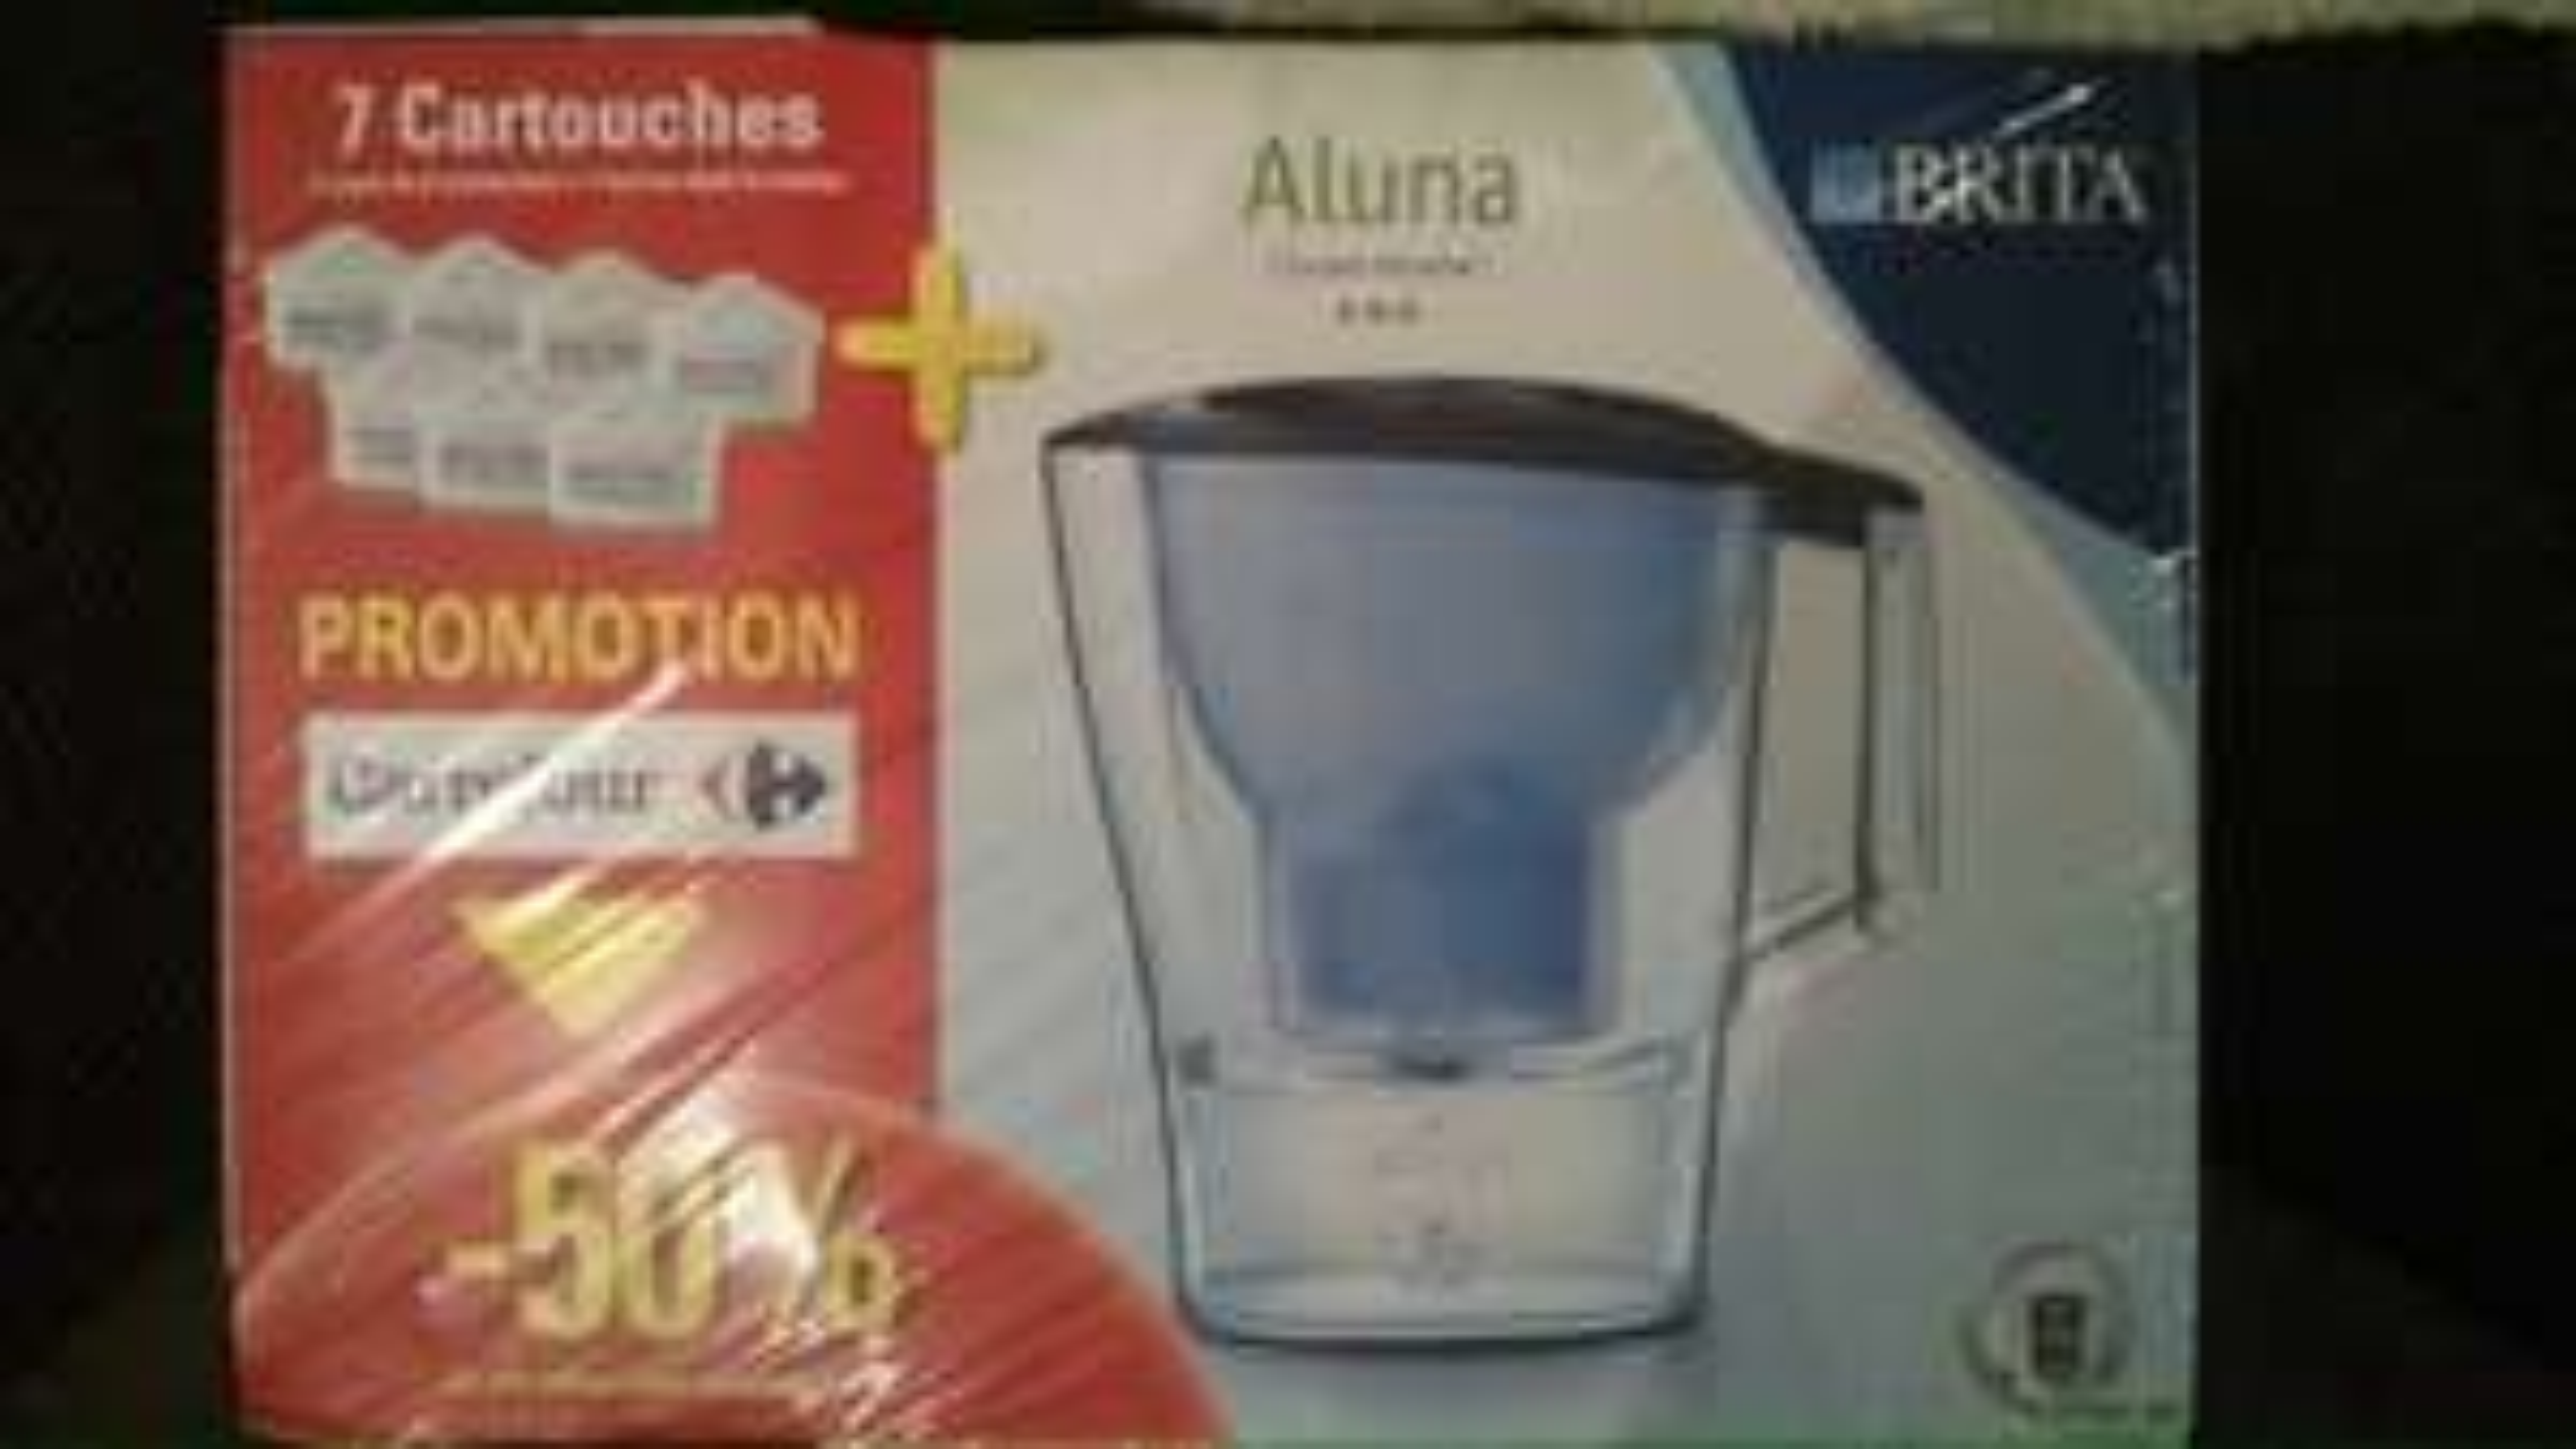 Carafe filtrante Brita Aluna + 7 cartouches